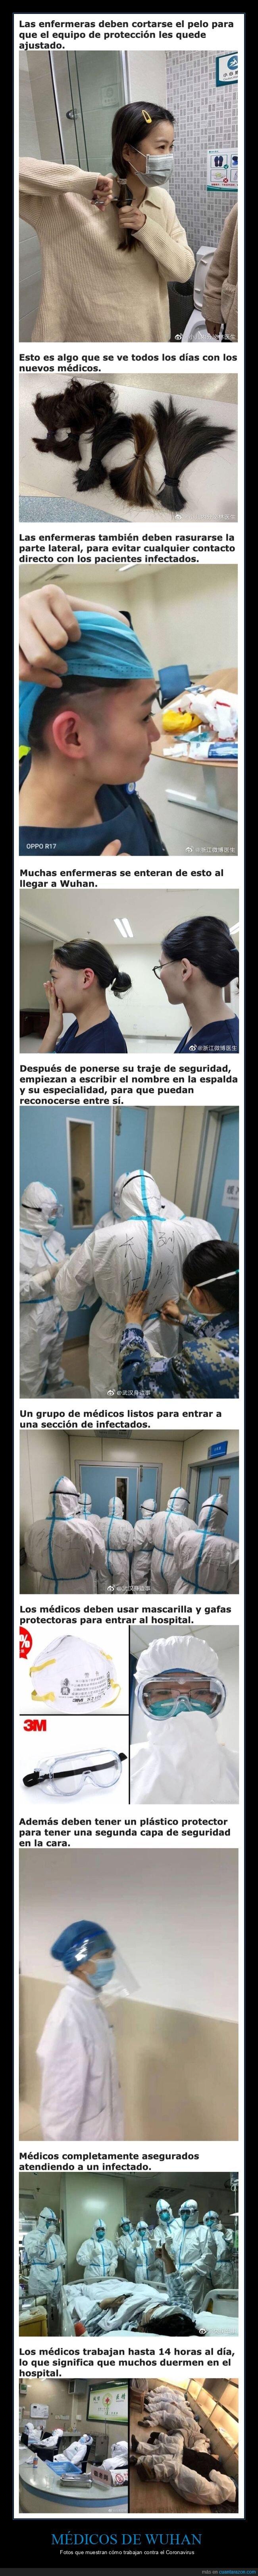 coronavirus,médicos,wuhan